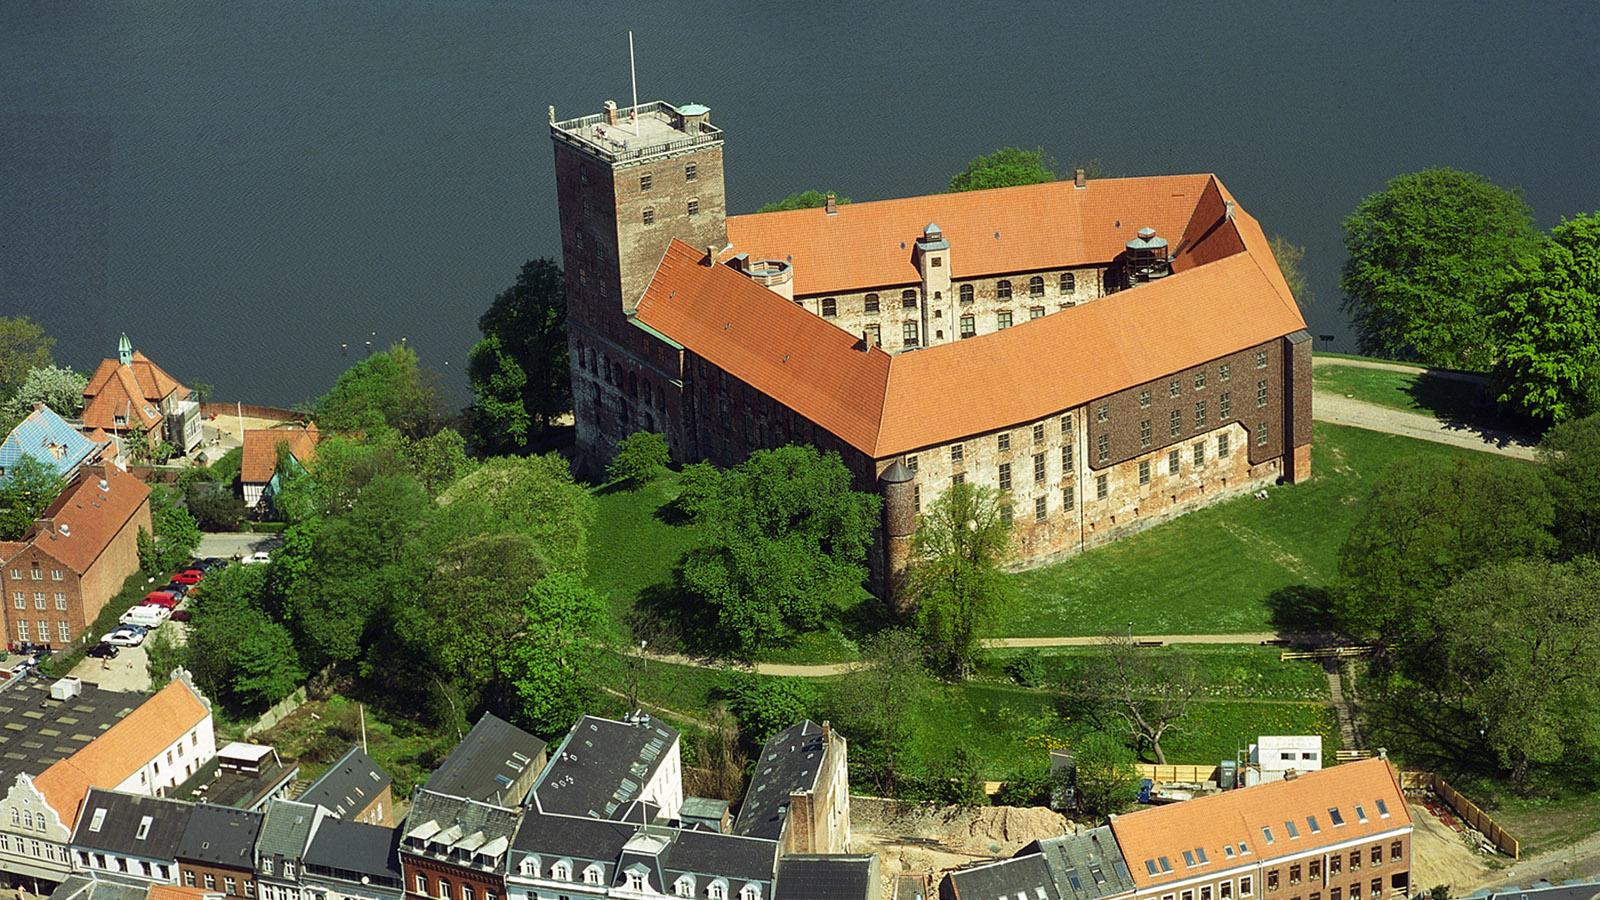 Koldinghus aus der Luft. Foto: Visit Denmark (Pressebild)